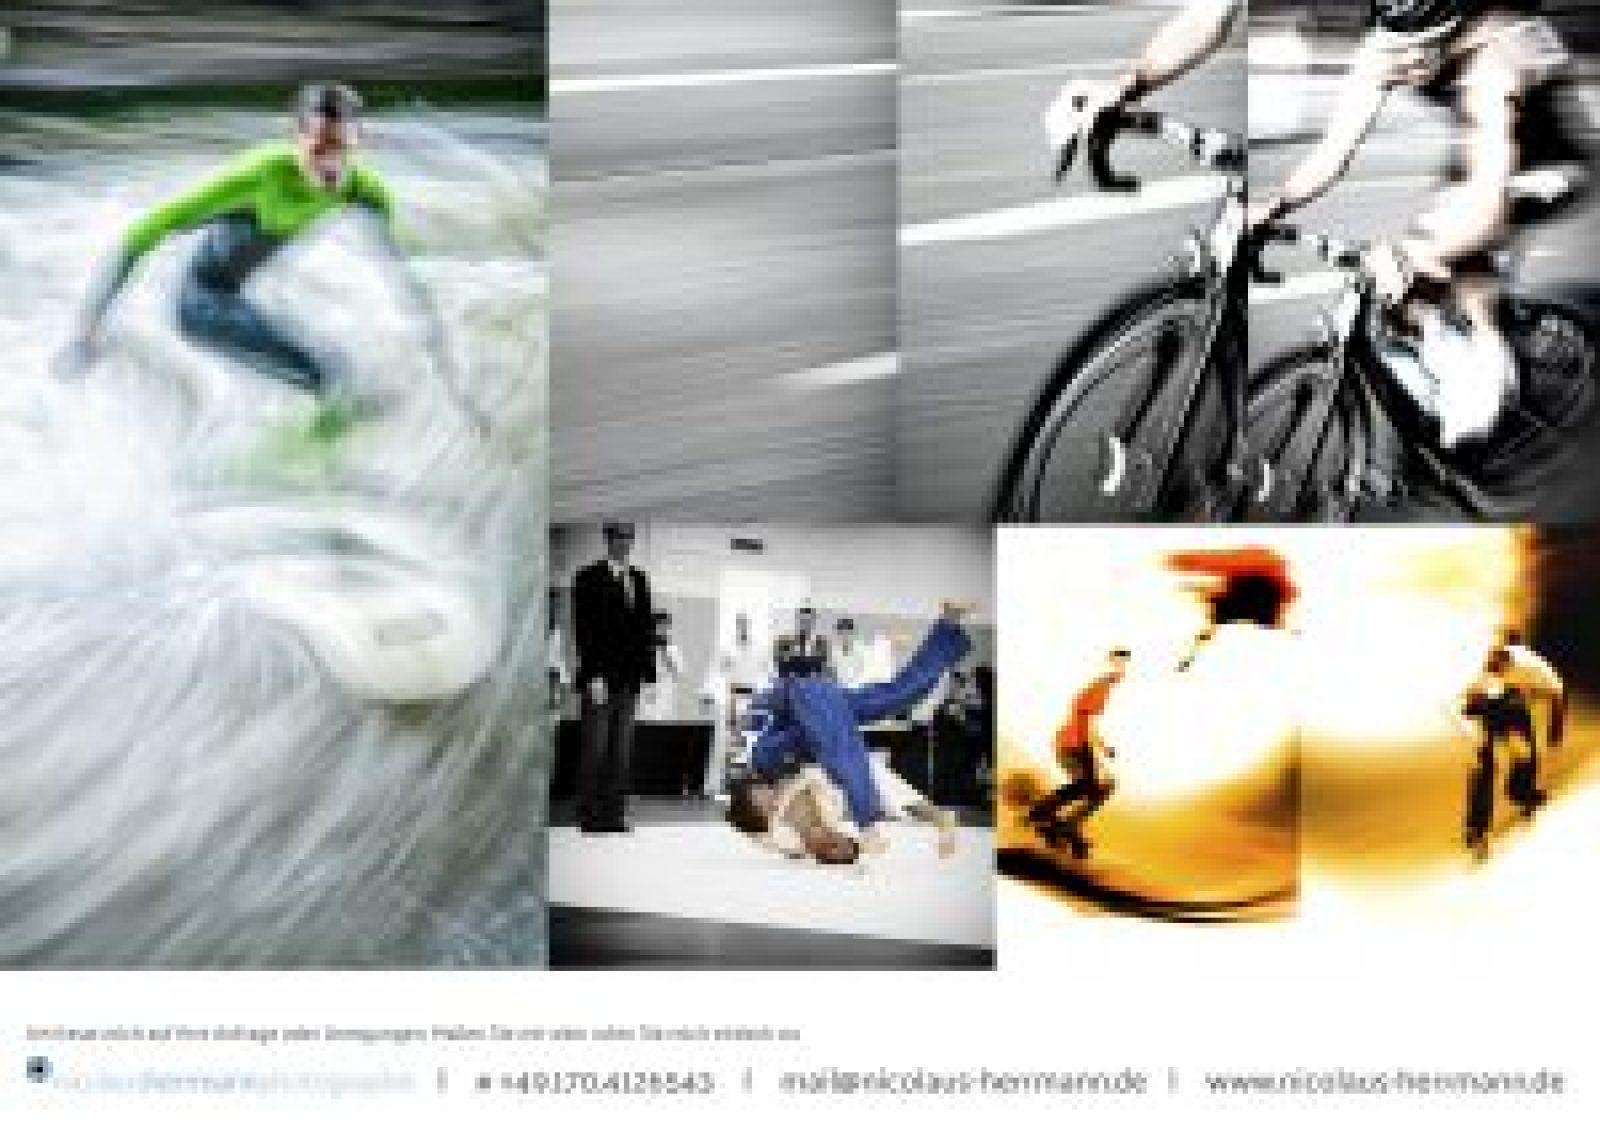 sedcard_sports_nicolaus herrmann